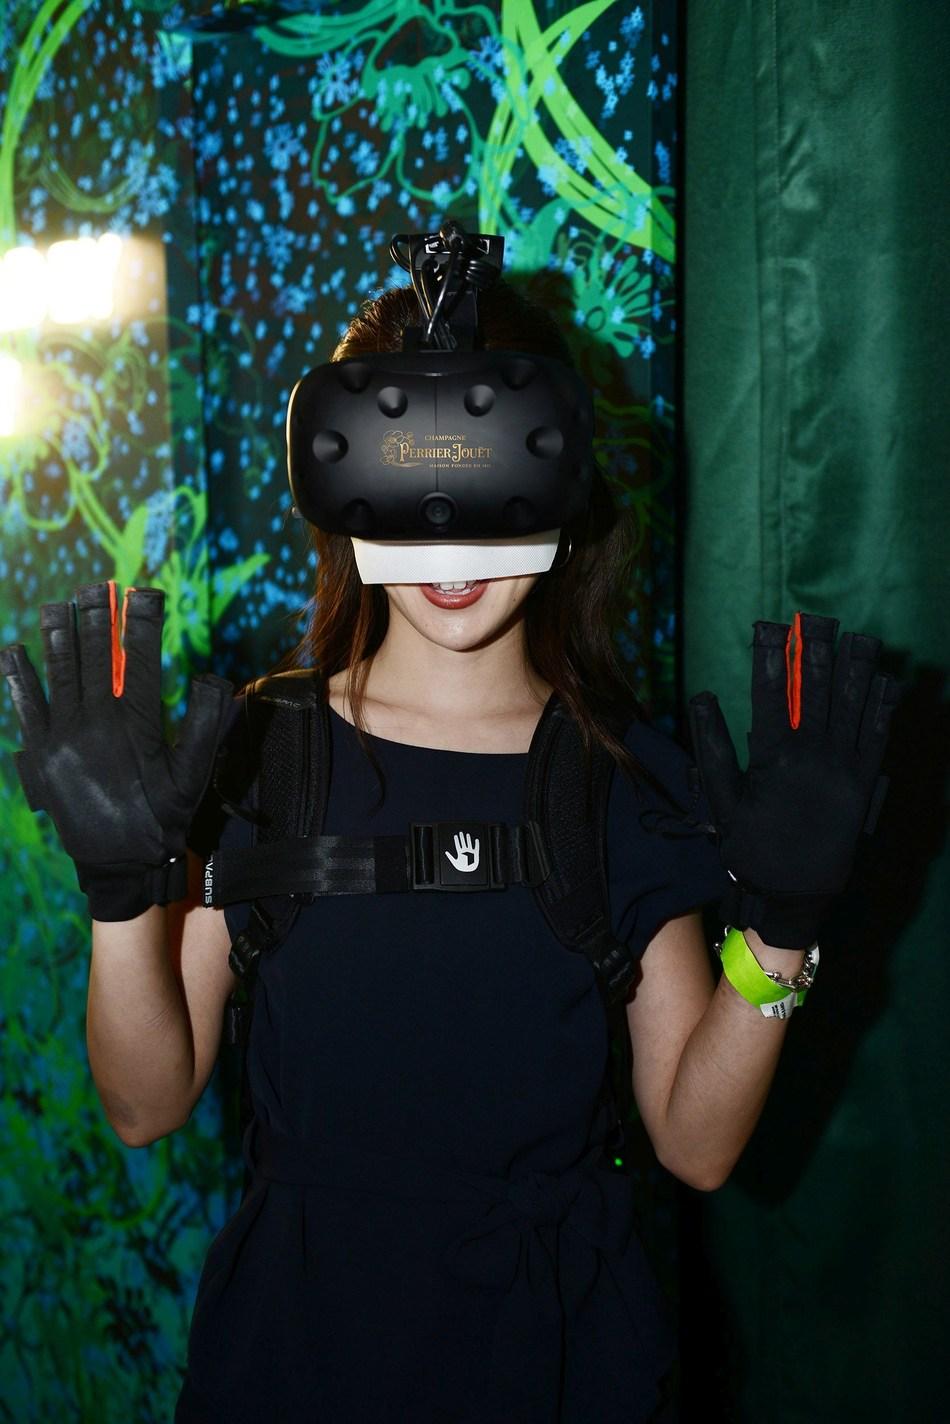 VR experience at Eden by Perrier-Jouët in Tokyo (PRNewsfoto/Maison Perrier Jouët)